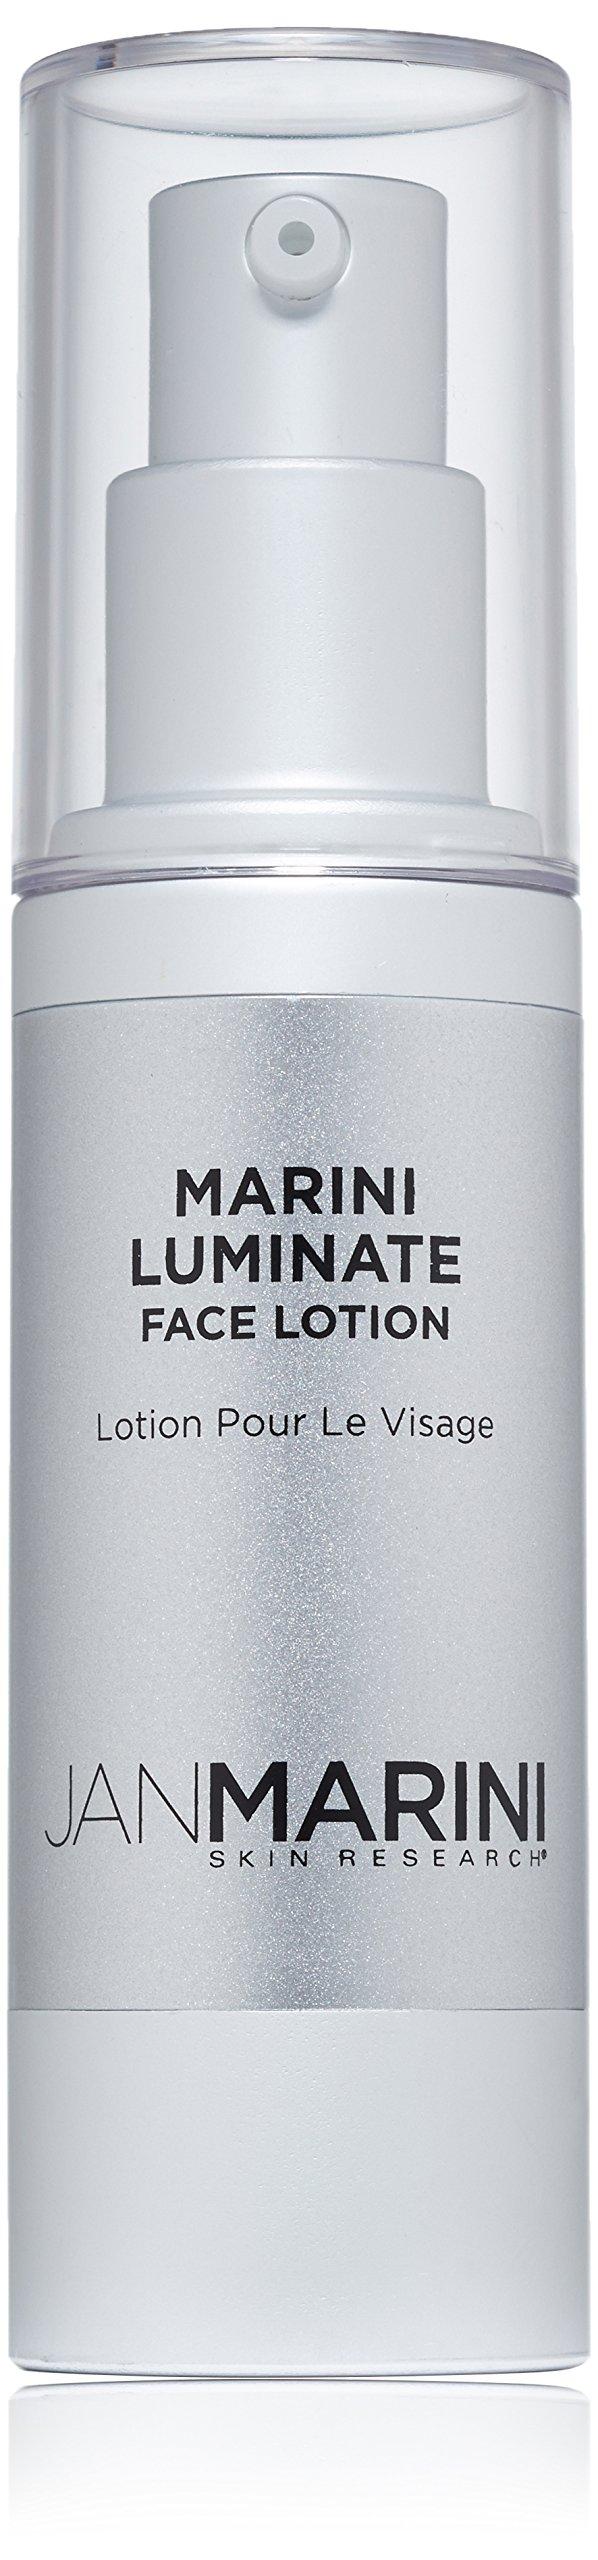 Amazon Com Jan Marini Skin Research Skin Care Management